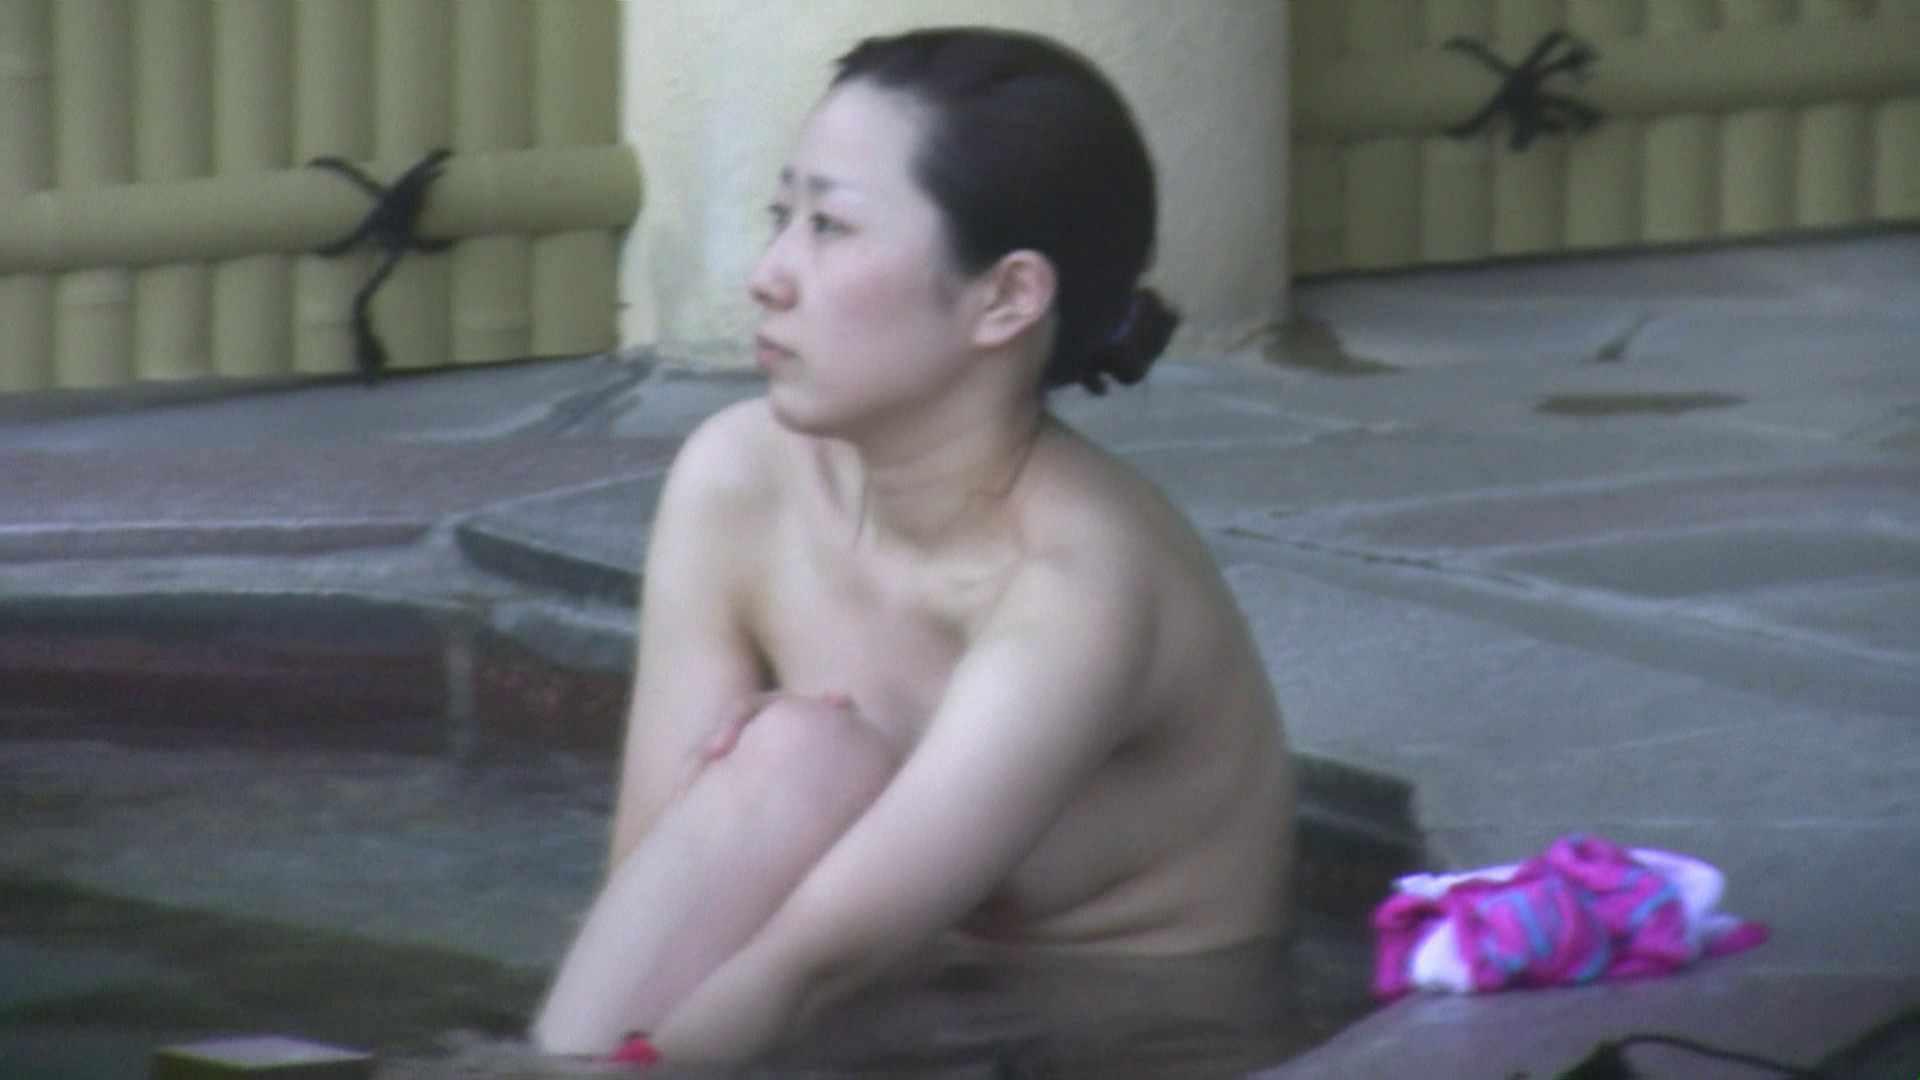 Aquaな露天風呂Vol.88【VIP限定】 OLのエロ生活 | 露天風呂  61連発 22